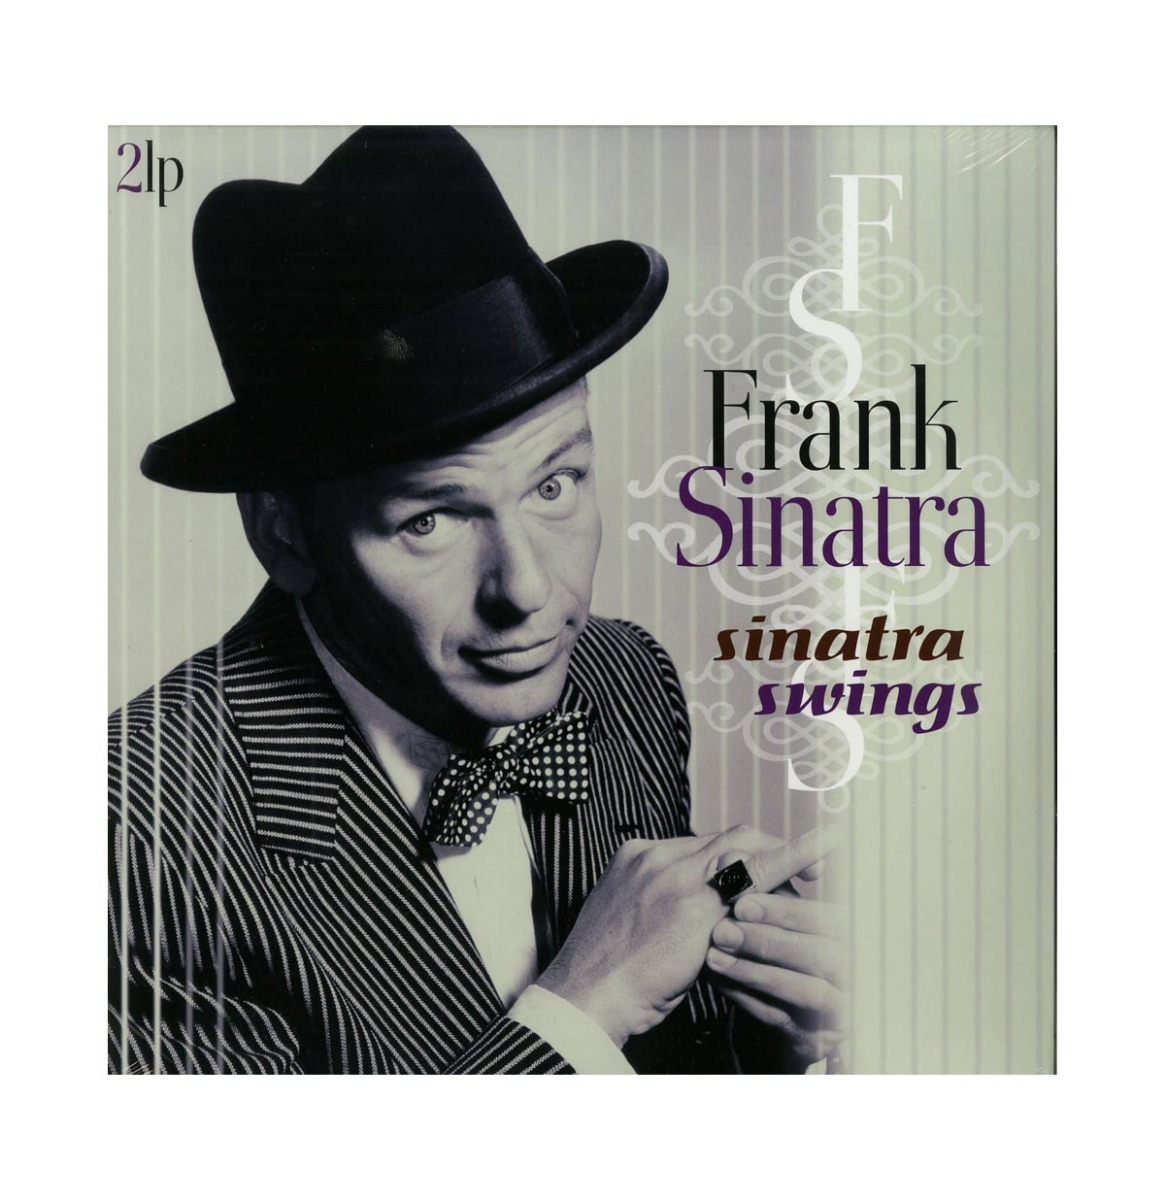 Frank Sinatra - Sinatra Swings 2 LP